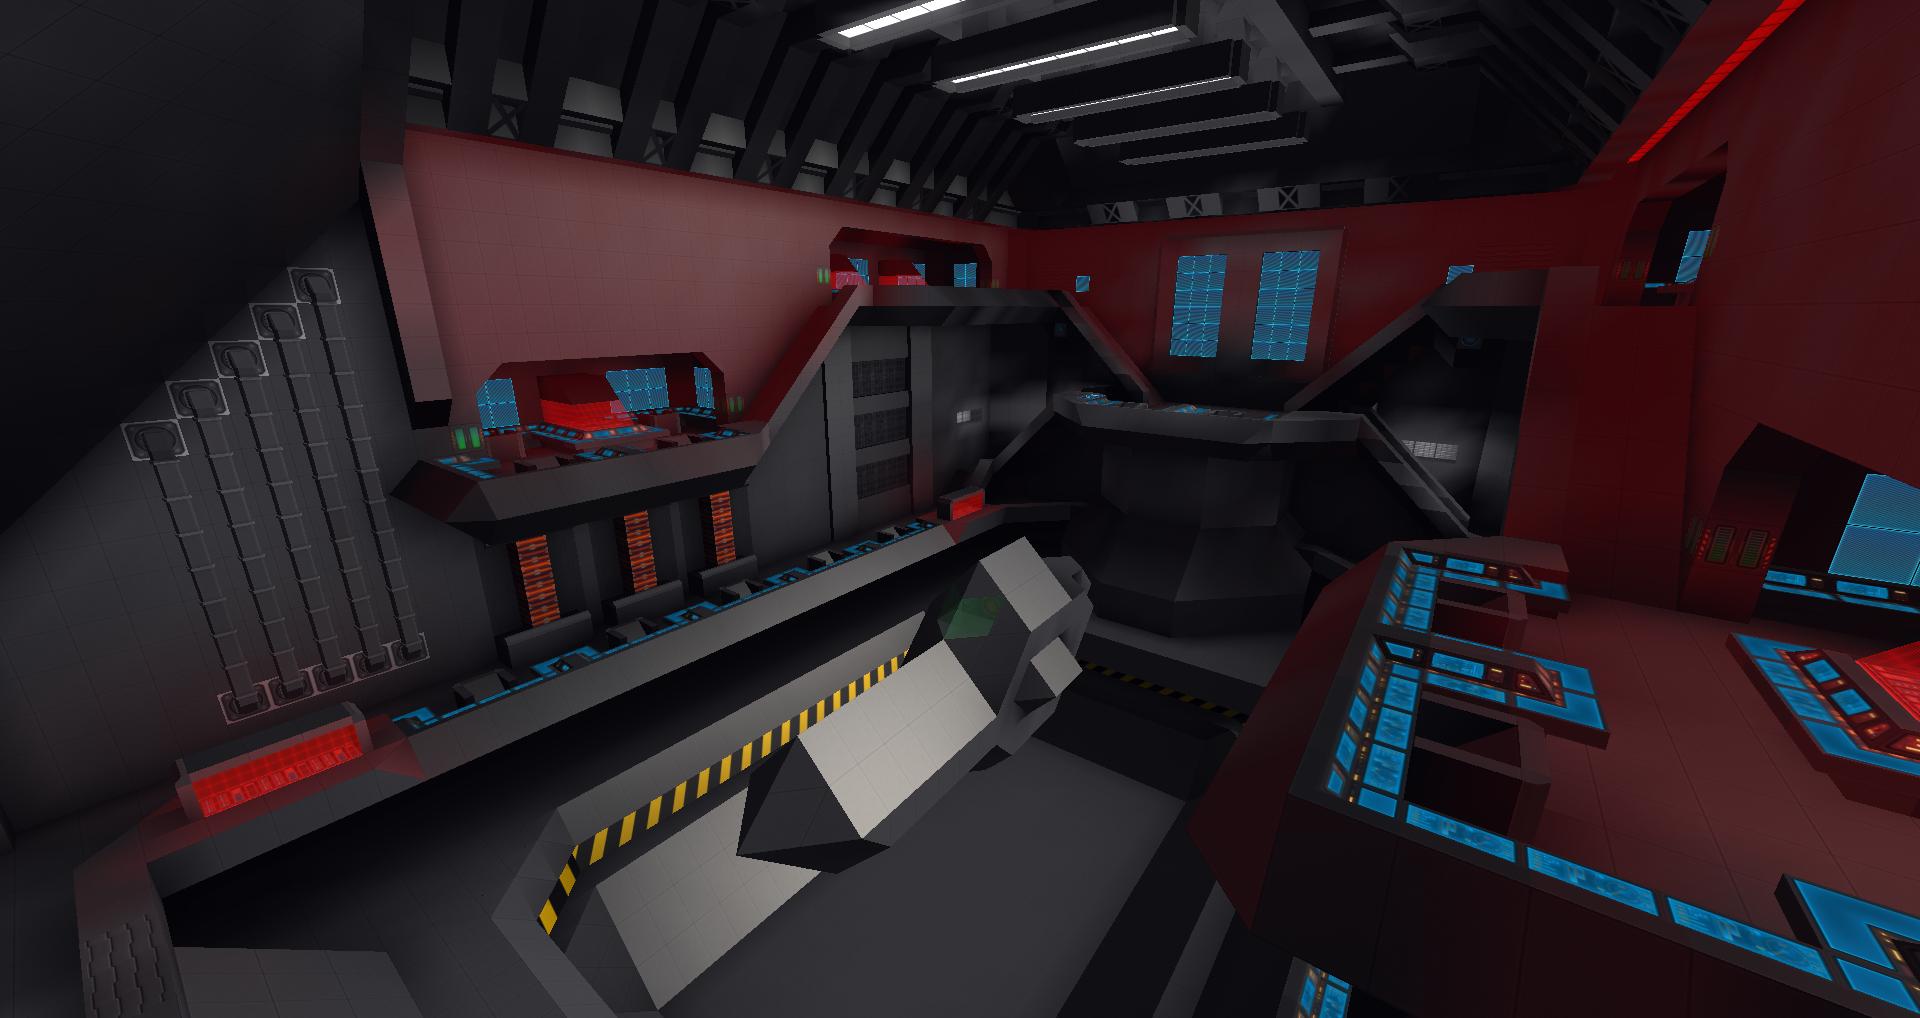 starmade-screenshot-0190.png